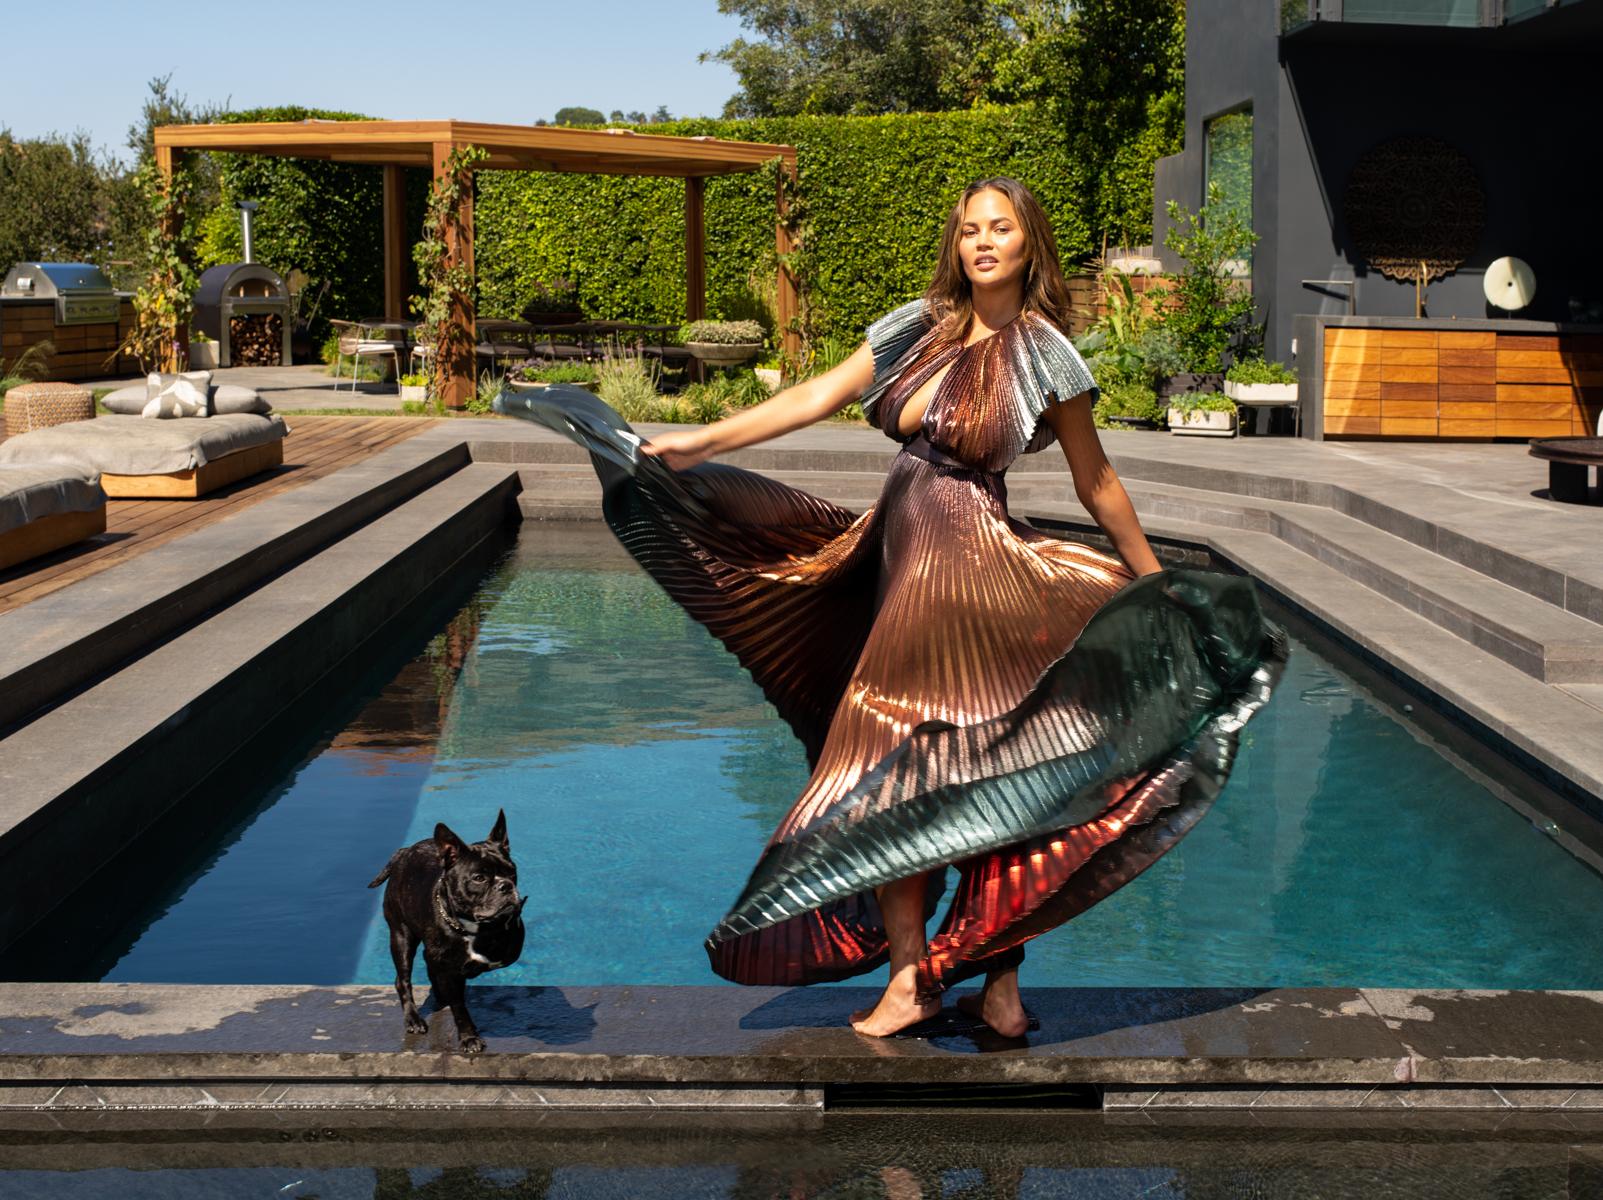 Chrissy Teigen with her dog Penny / Vogue Magazine